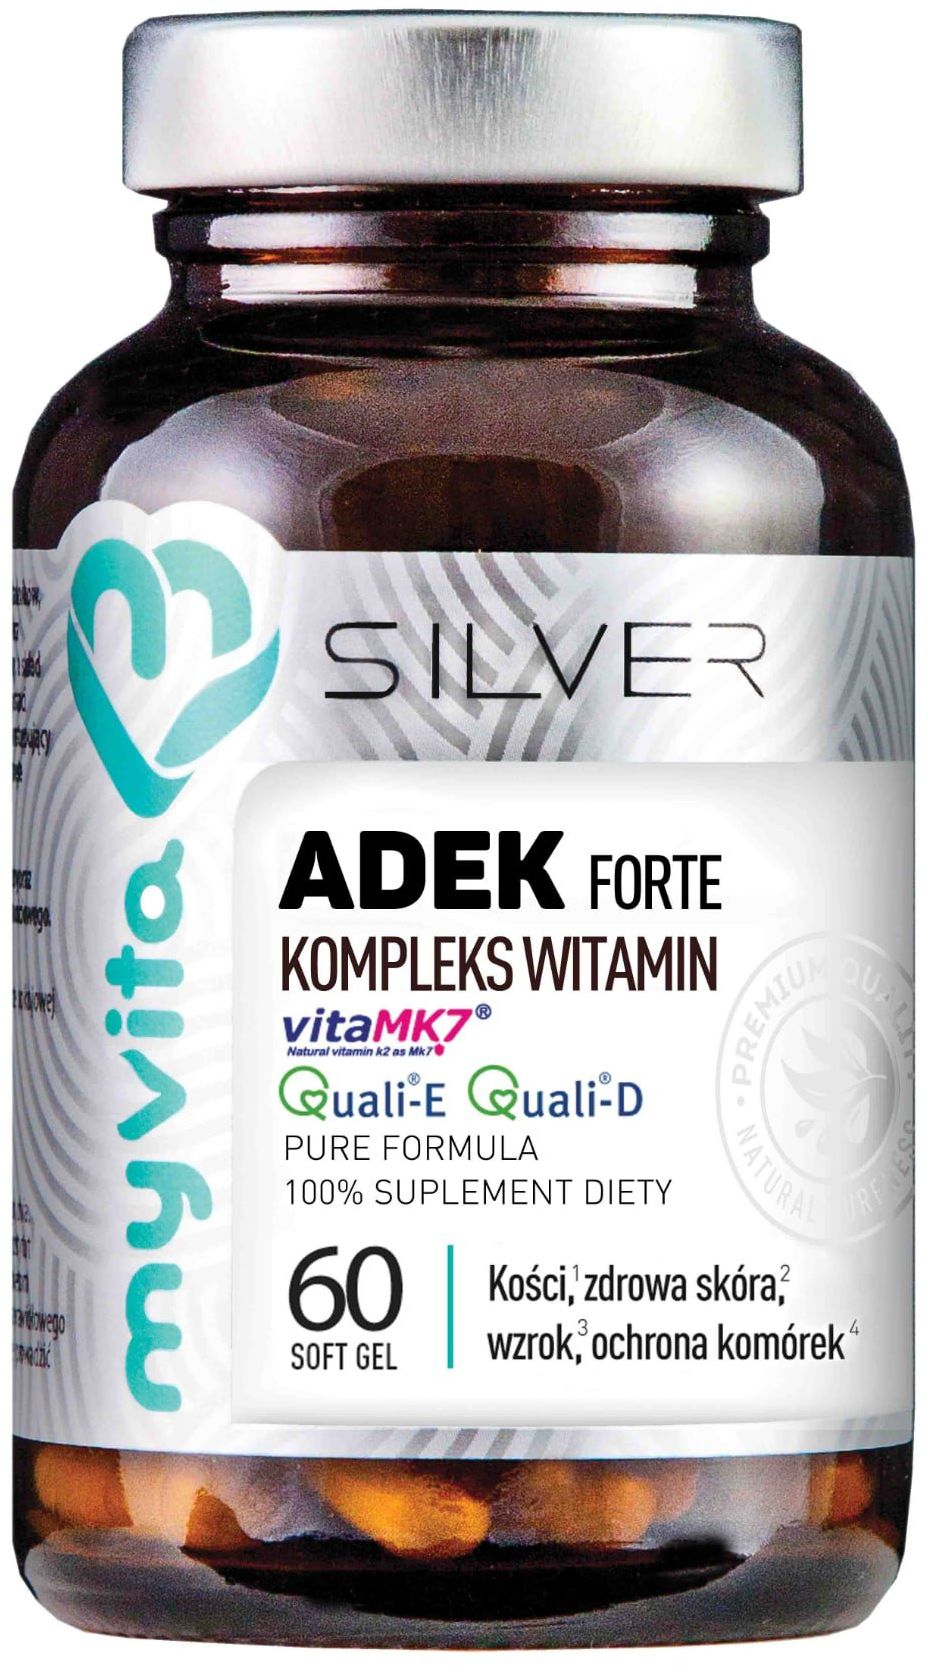 Witaminy ADEK Forte Kompleks Witamin (60 softgels) Silver MyVita